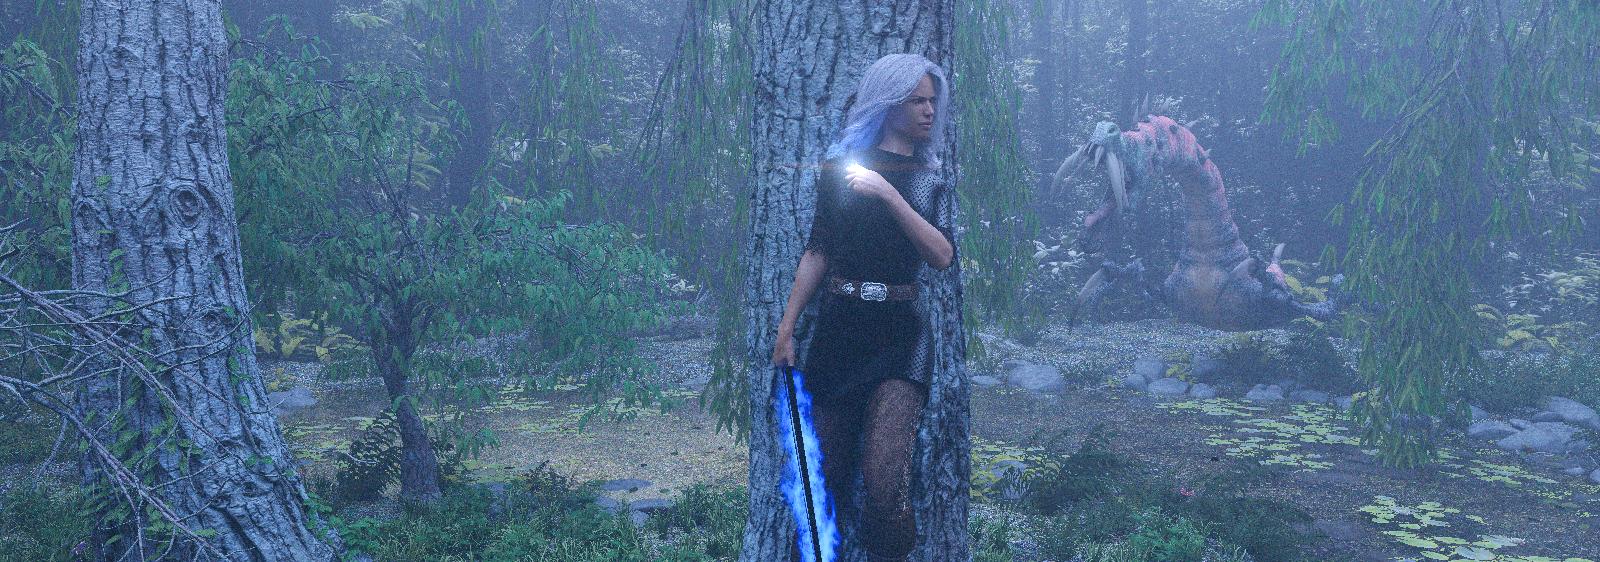 Segnbora goes hunting